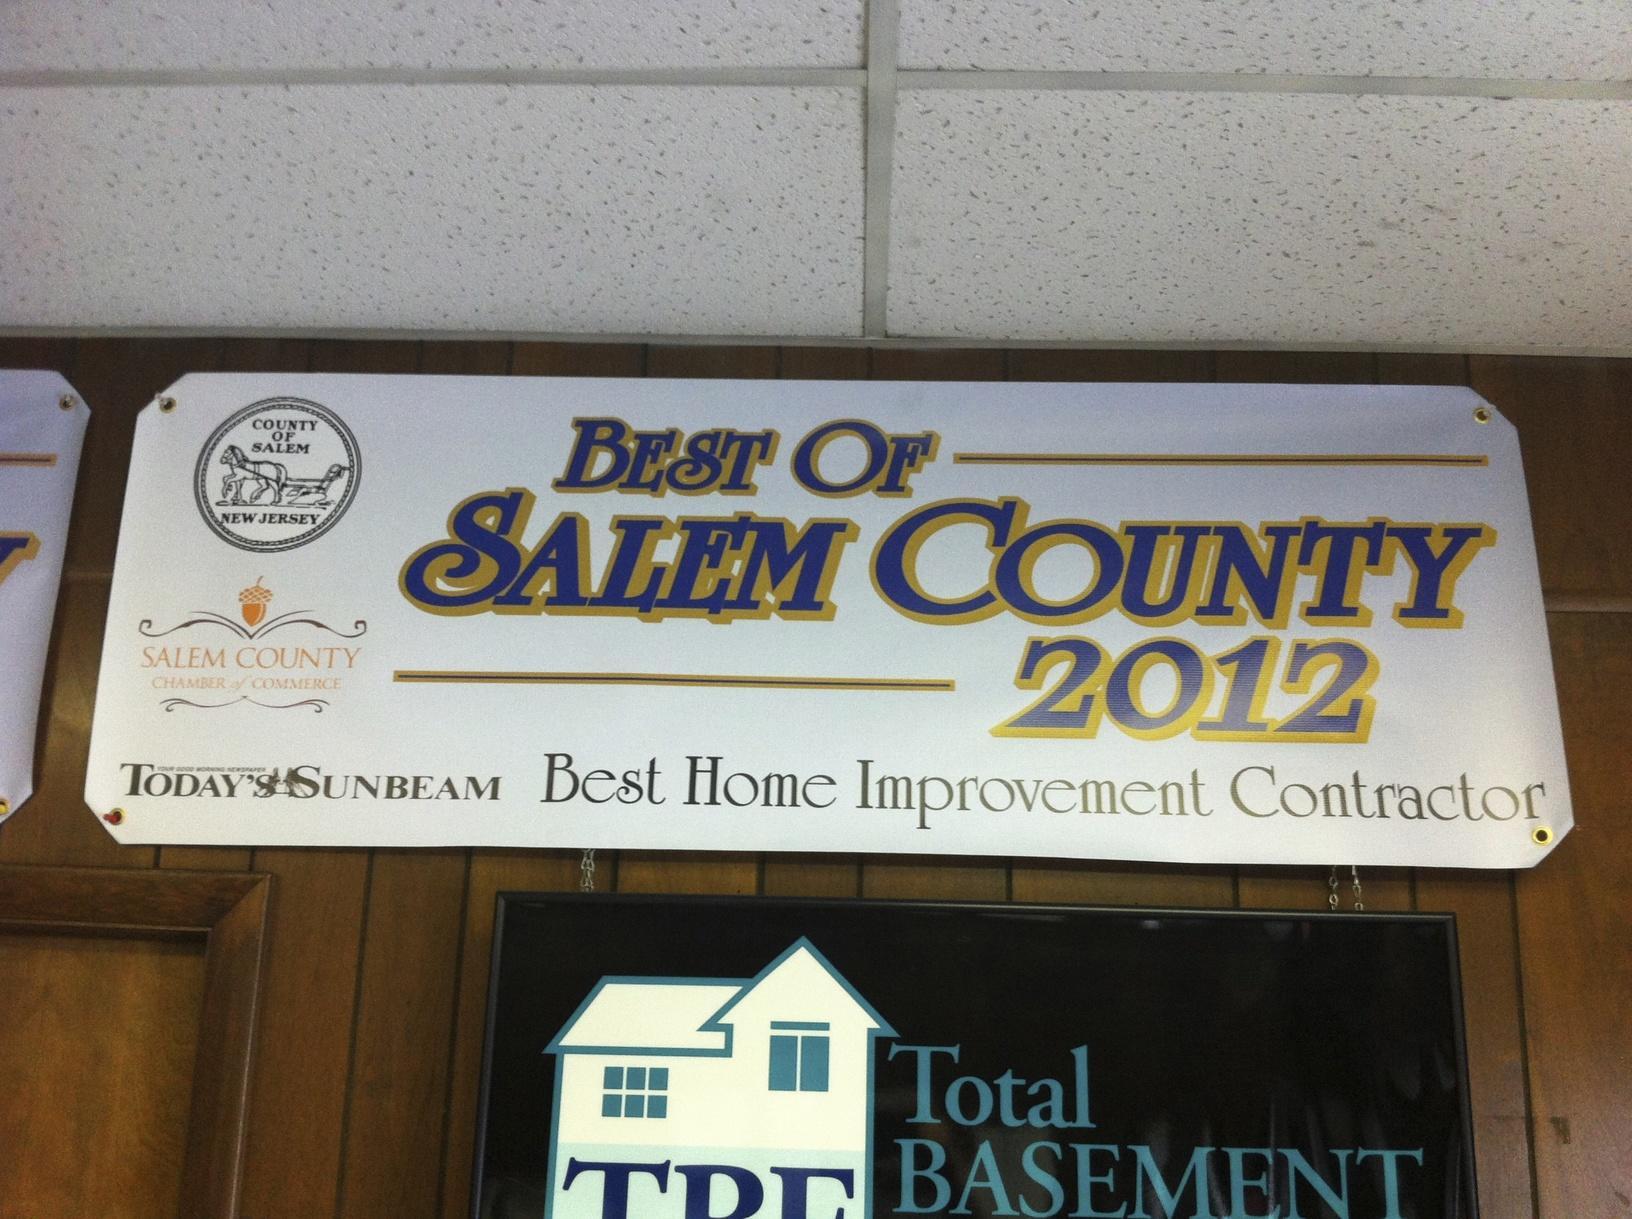 Best in Salem County 2012